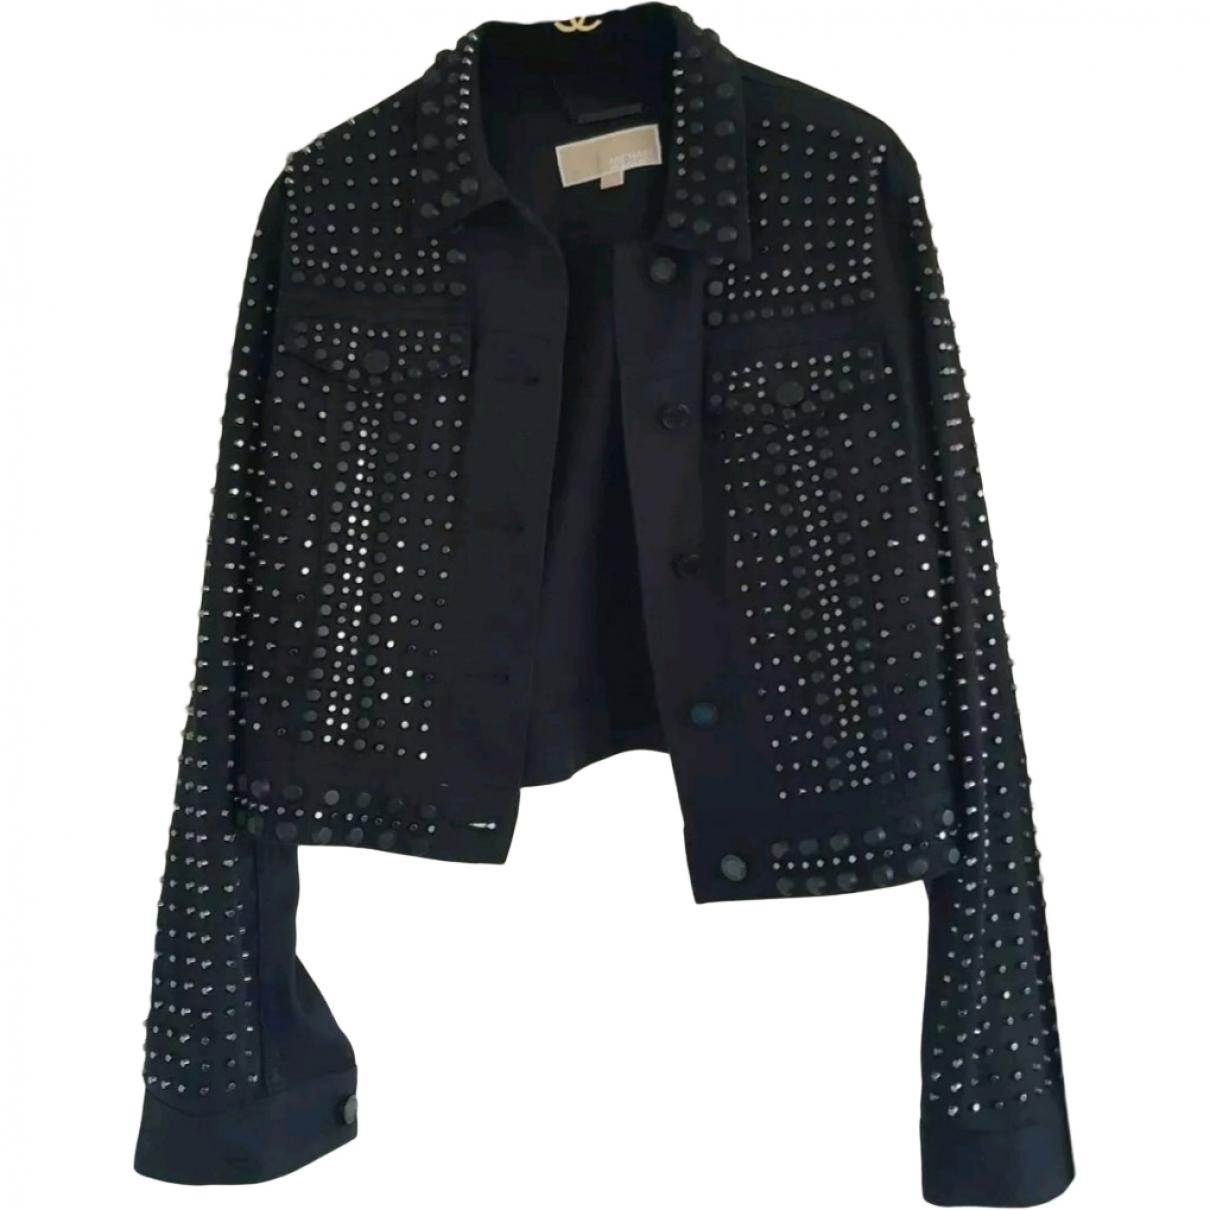 Michael Kors \N Black Denim - Jeans jacket for Women M International